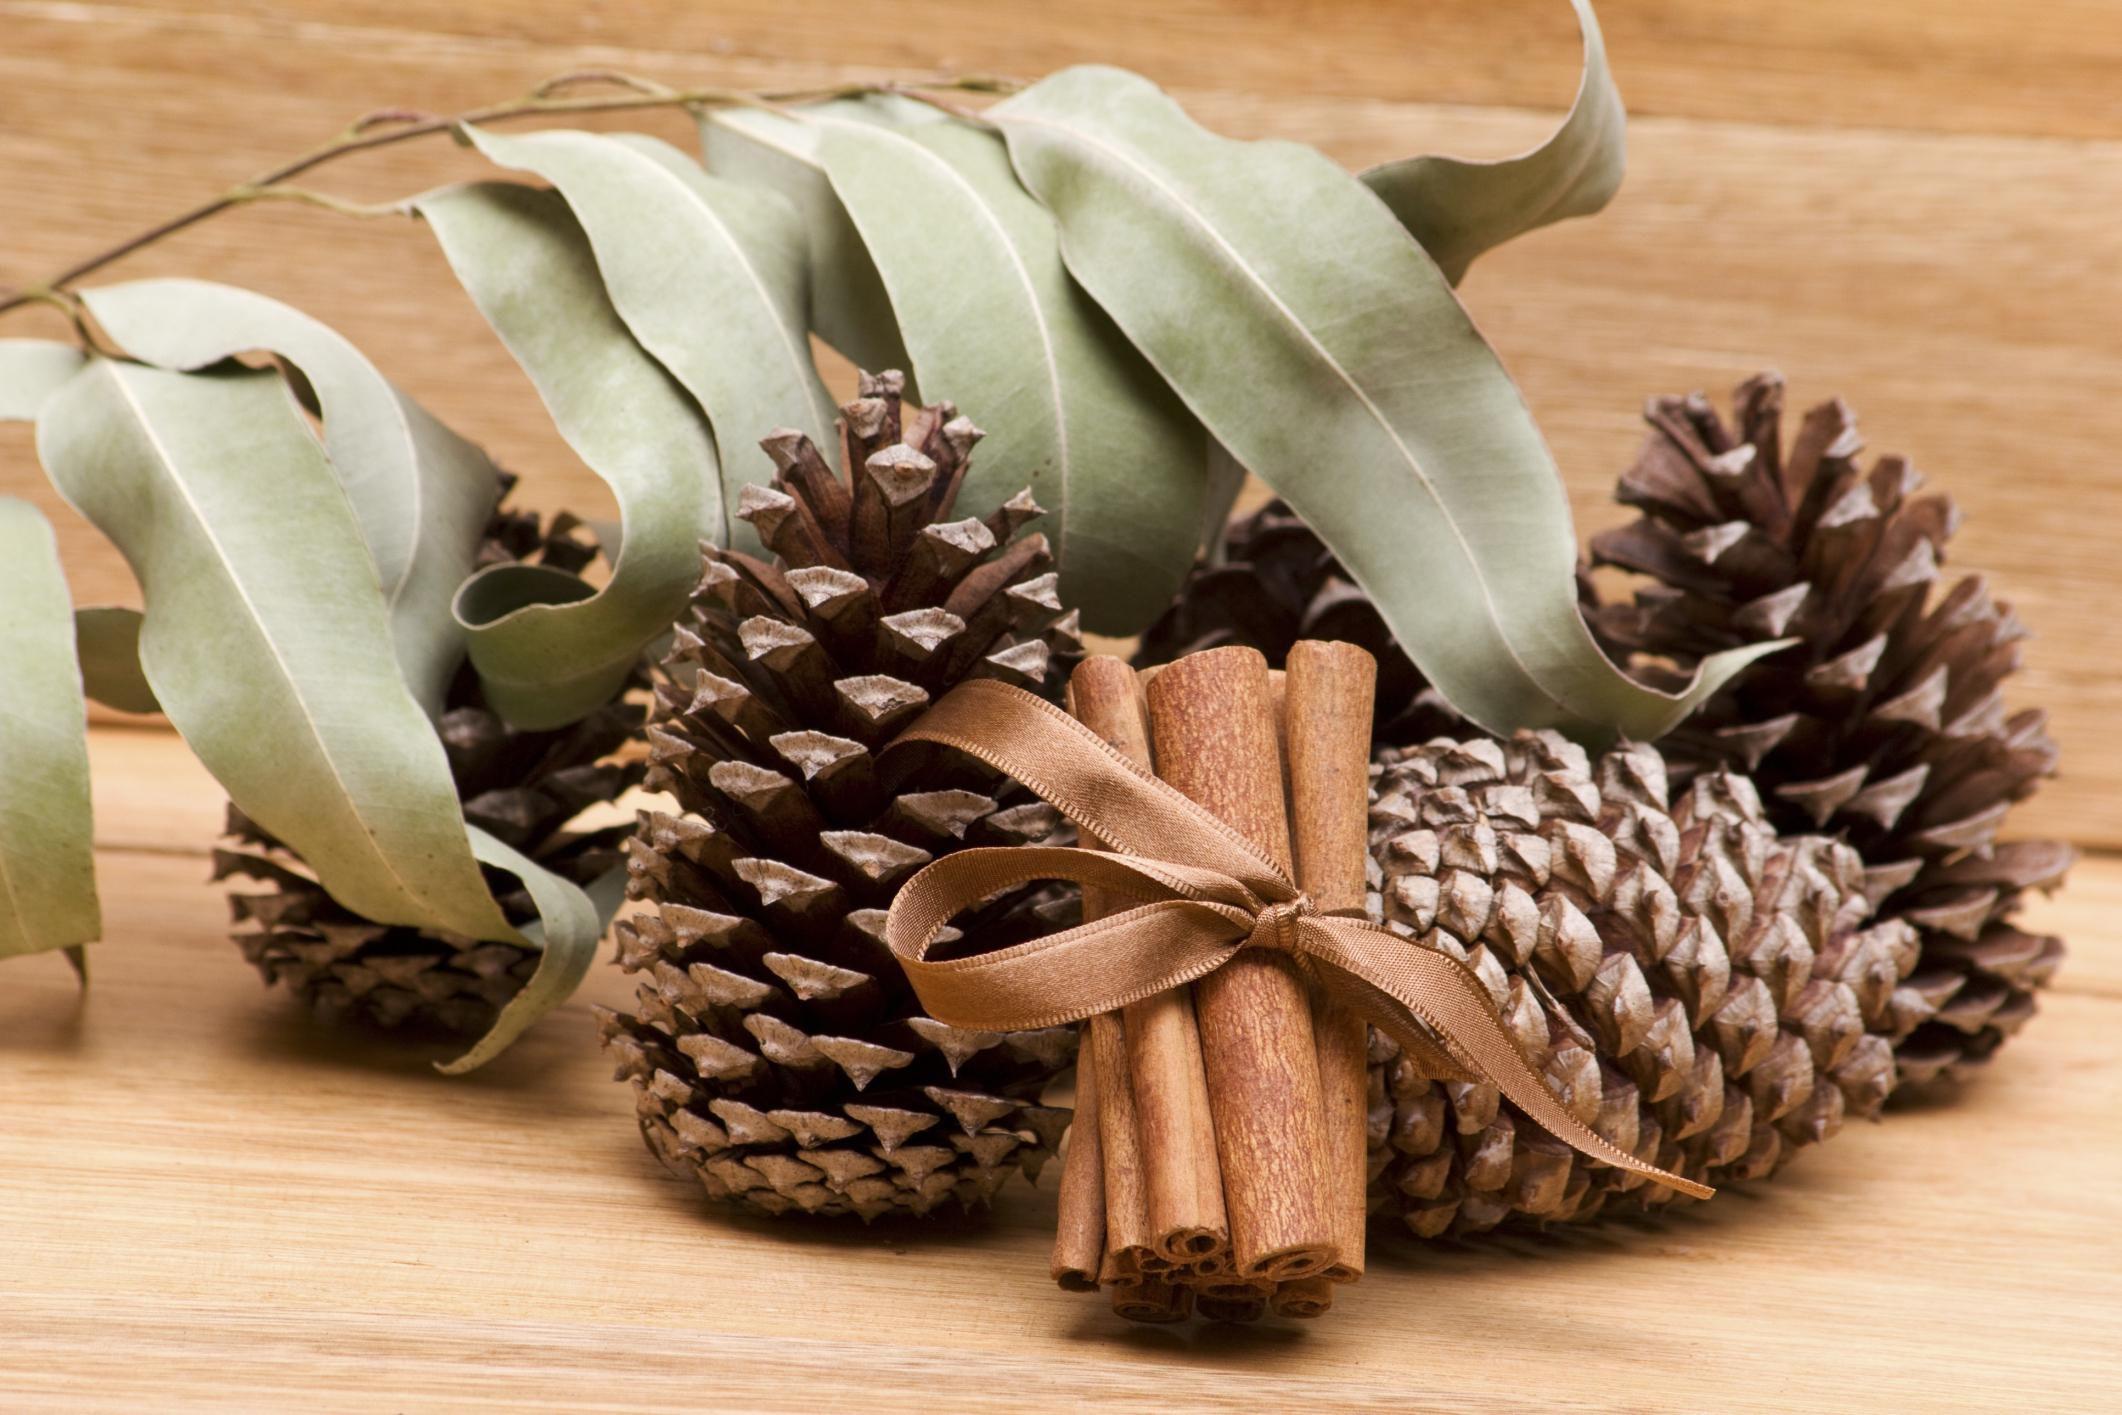 Pine scent in pot